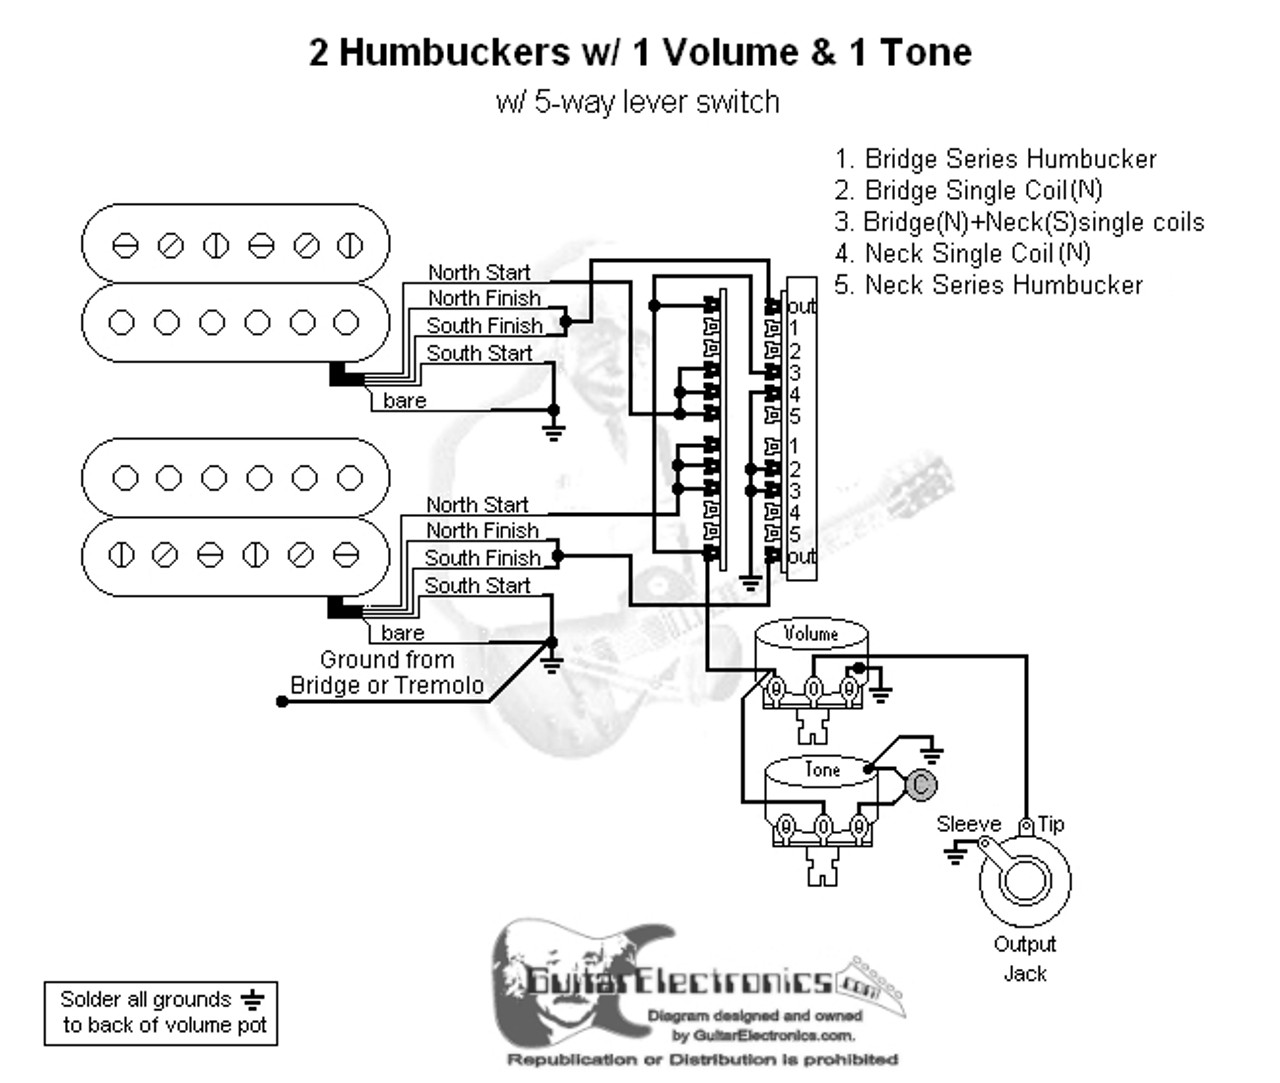 medium resolution of wiring diagram 2 humbuckers 1 volume 1 tone 5 way switch wiring2 humbuckers 5 way lever